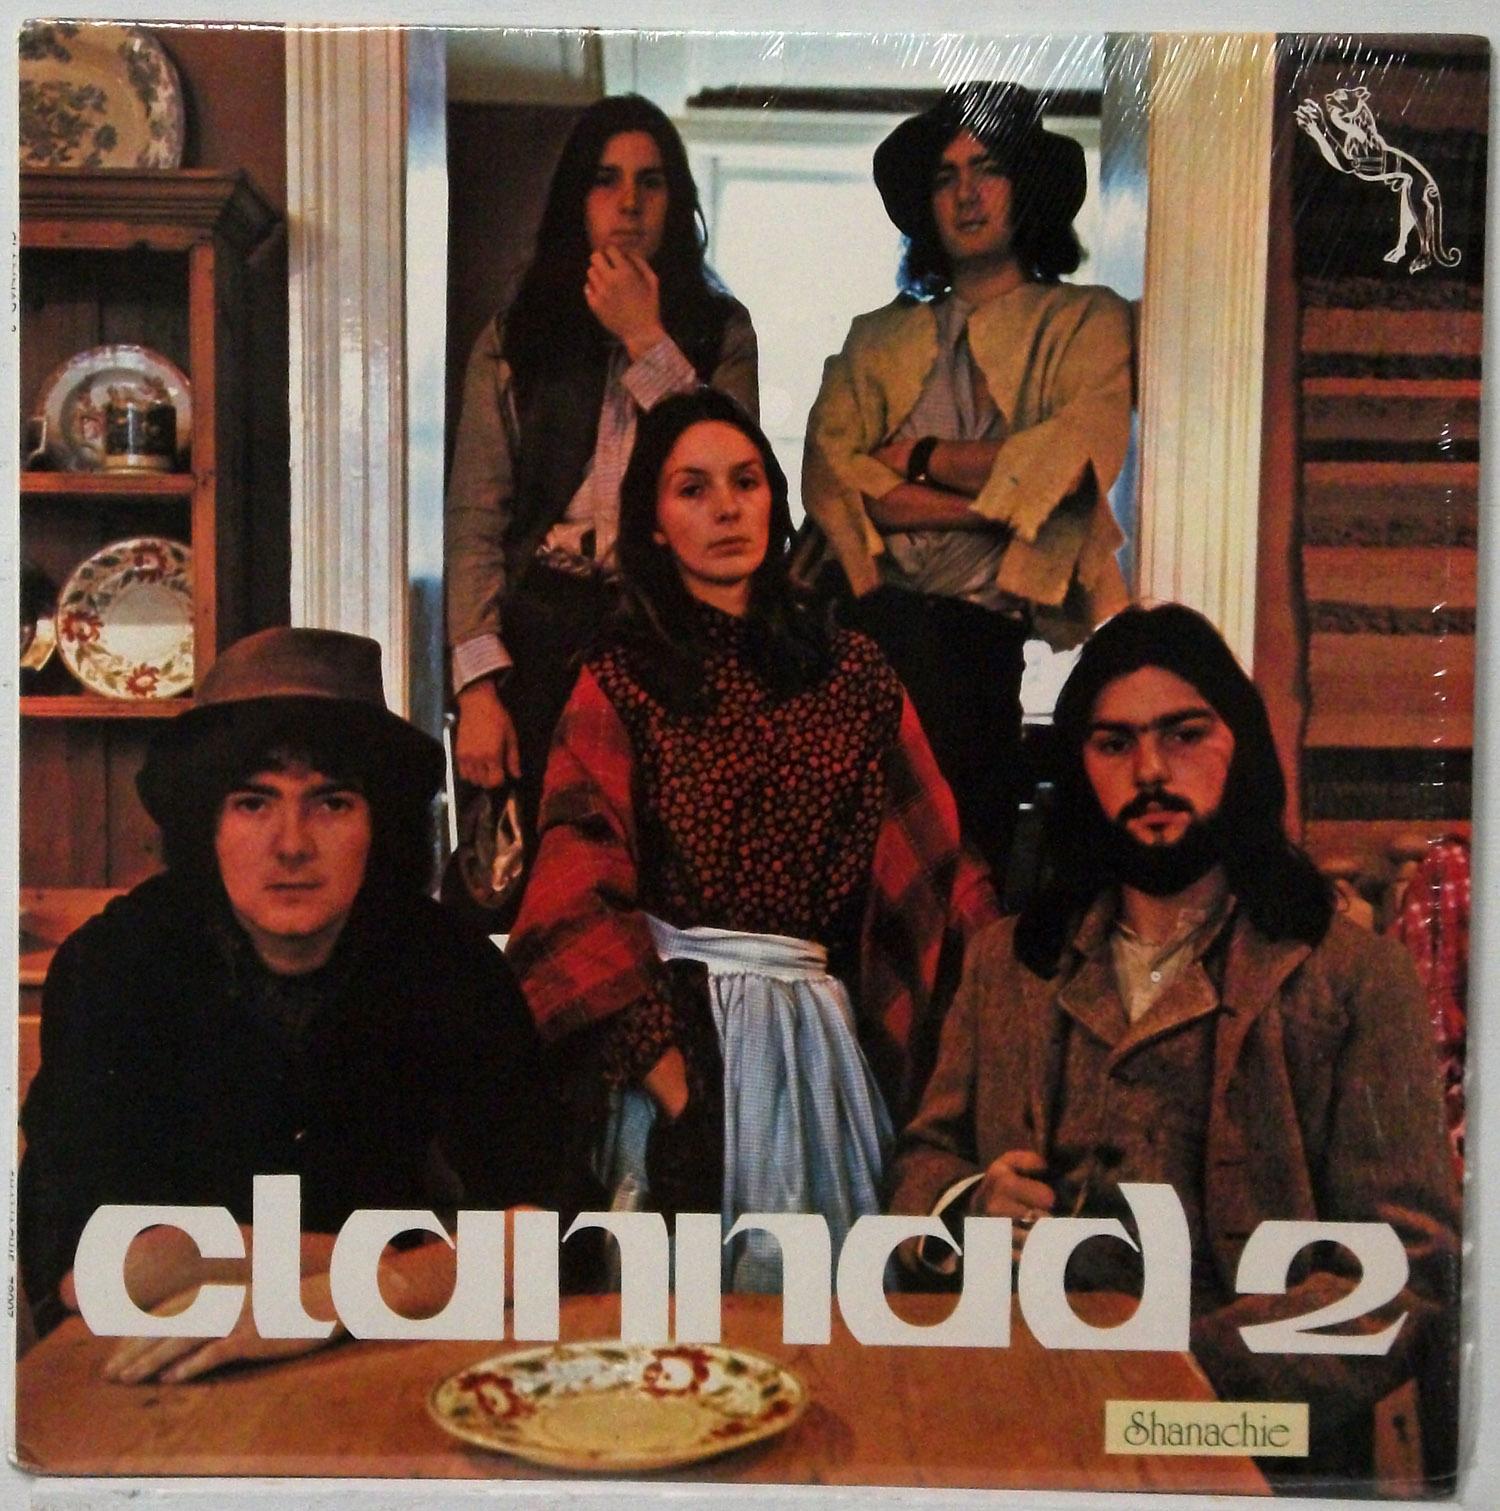 Clannad - Clannad 2 1979 US LP